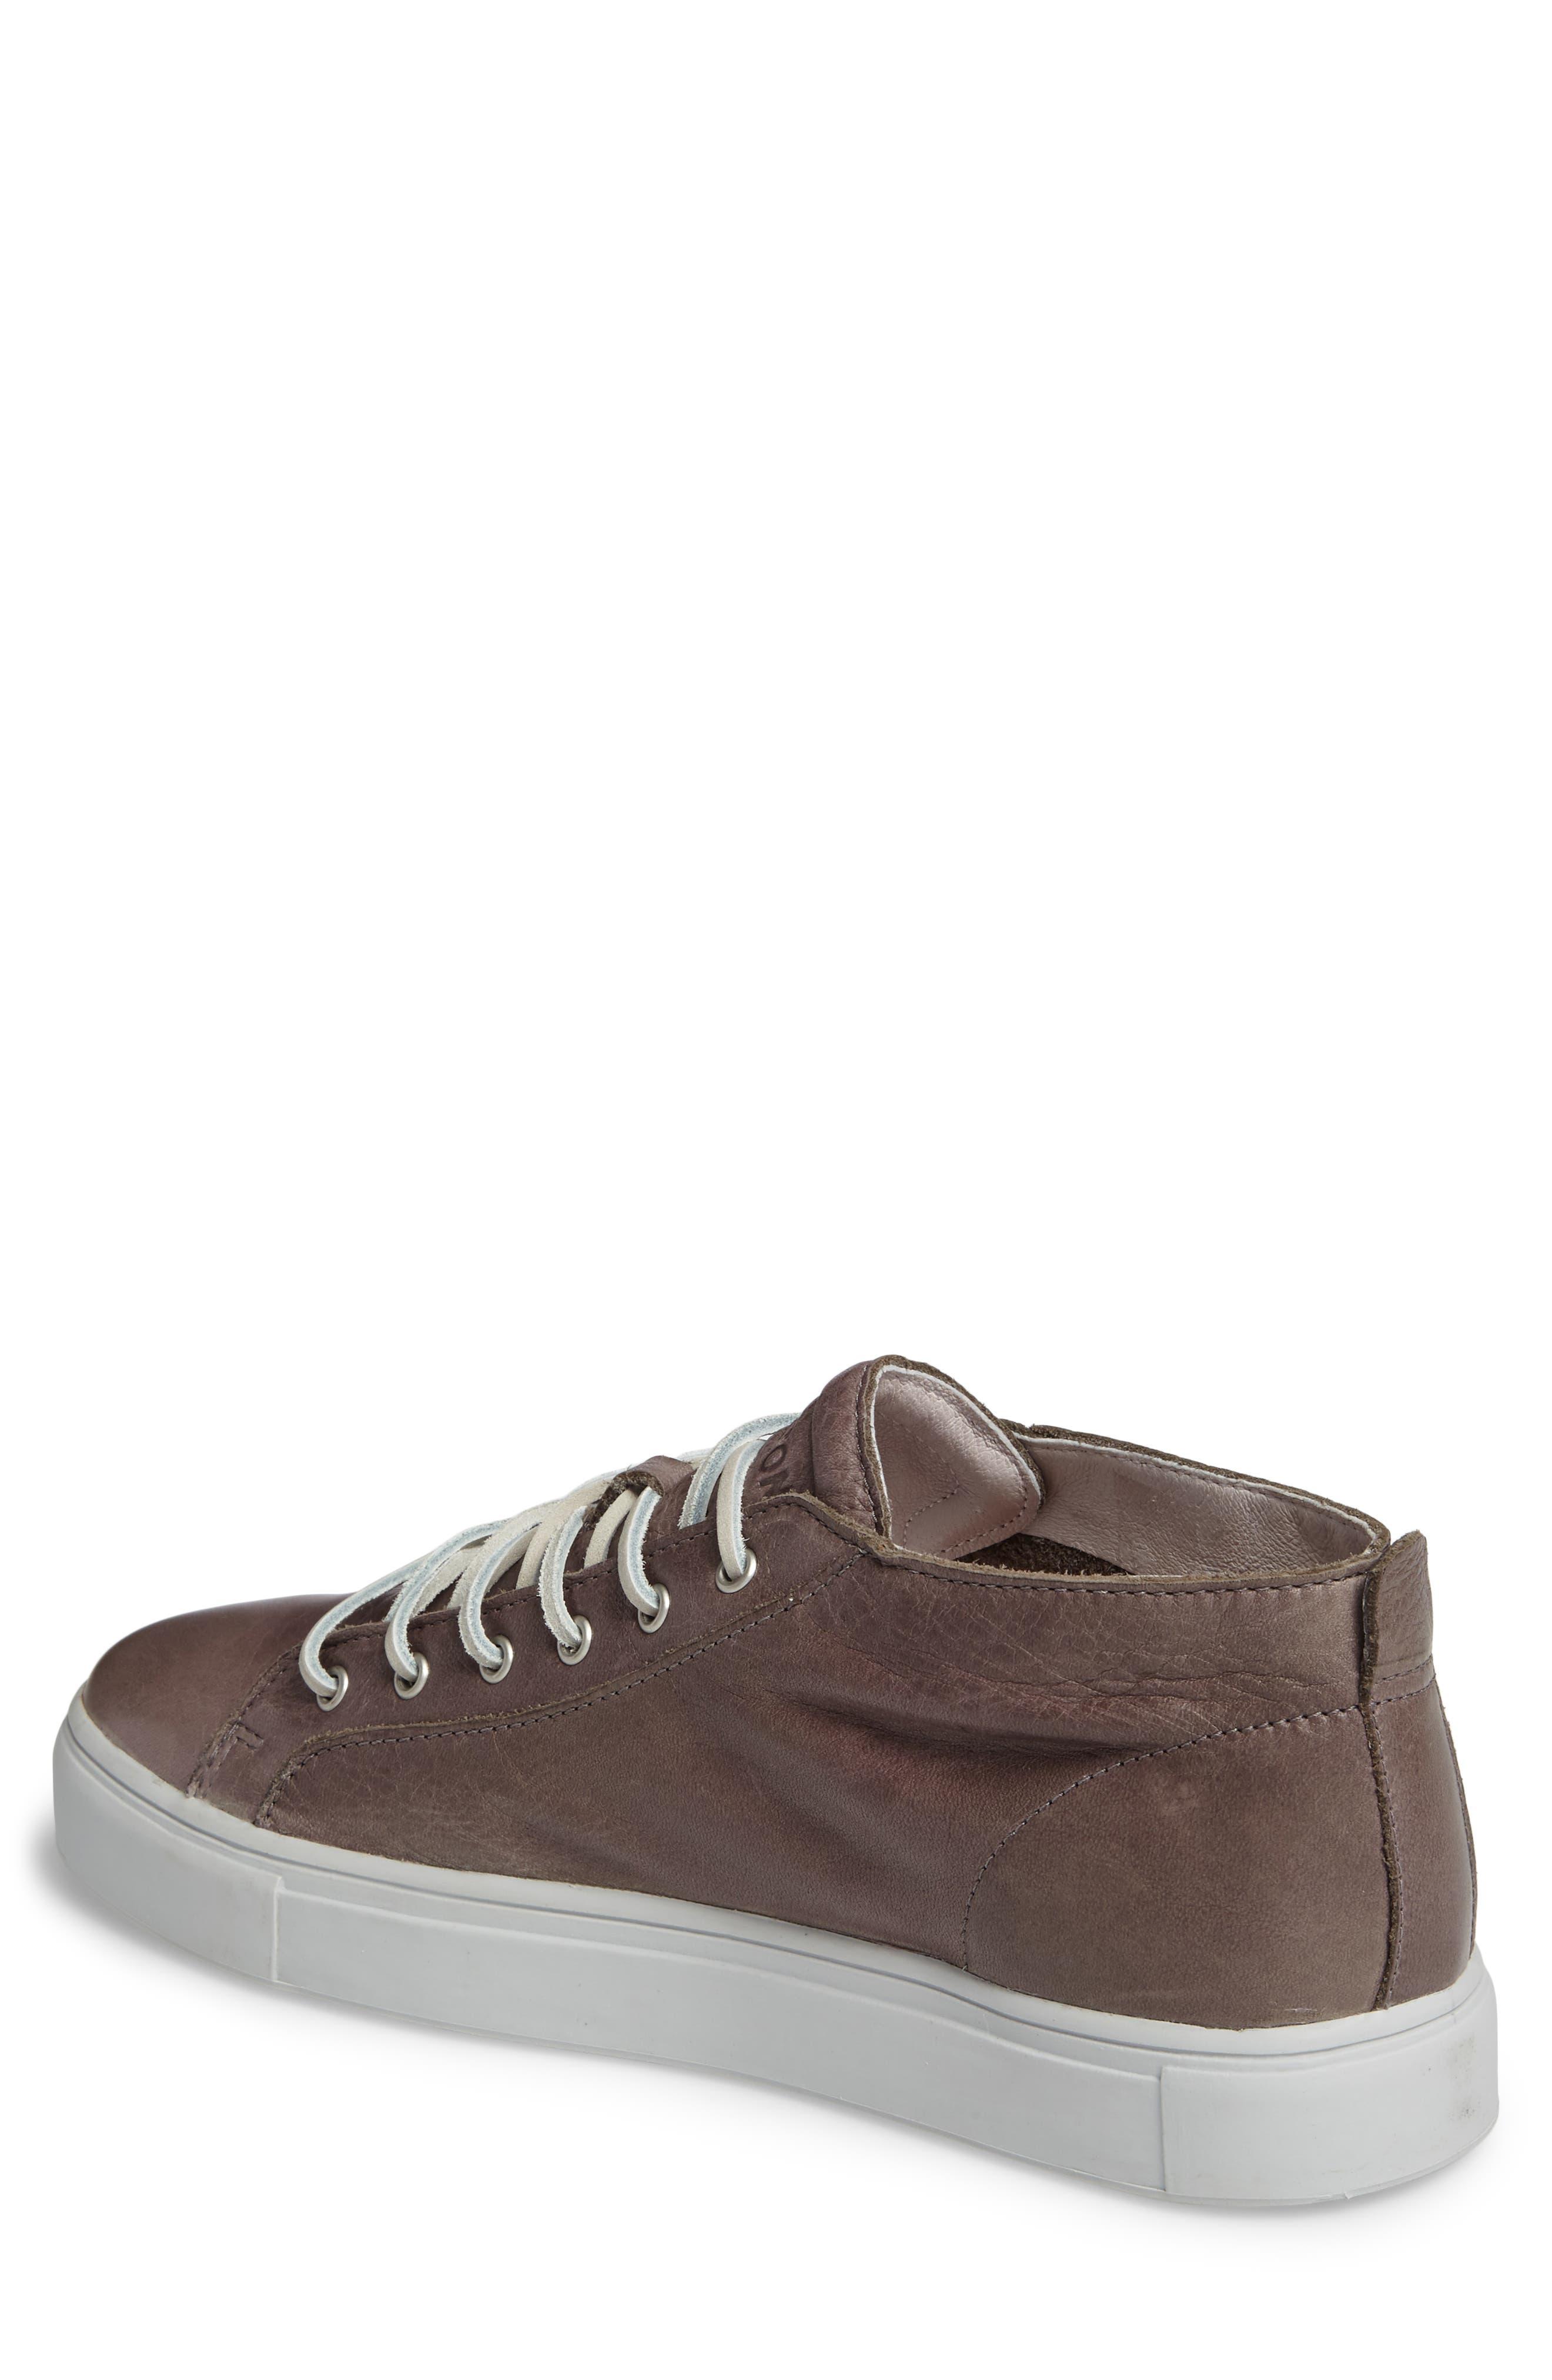 'LM11' Sneaker,                             Alternate thumbnail 2, color,                             020